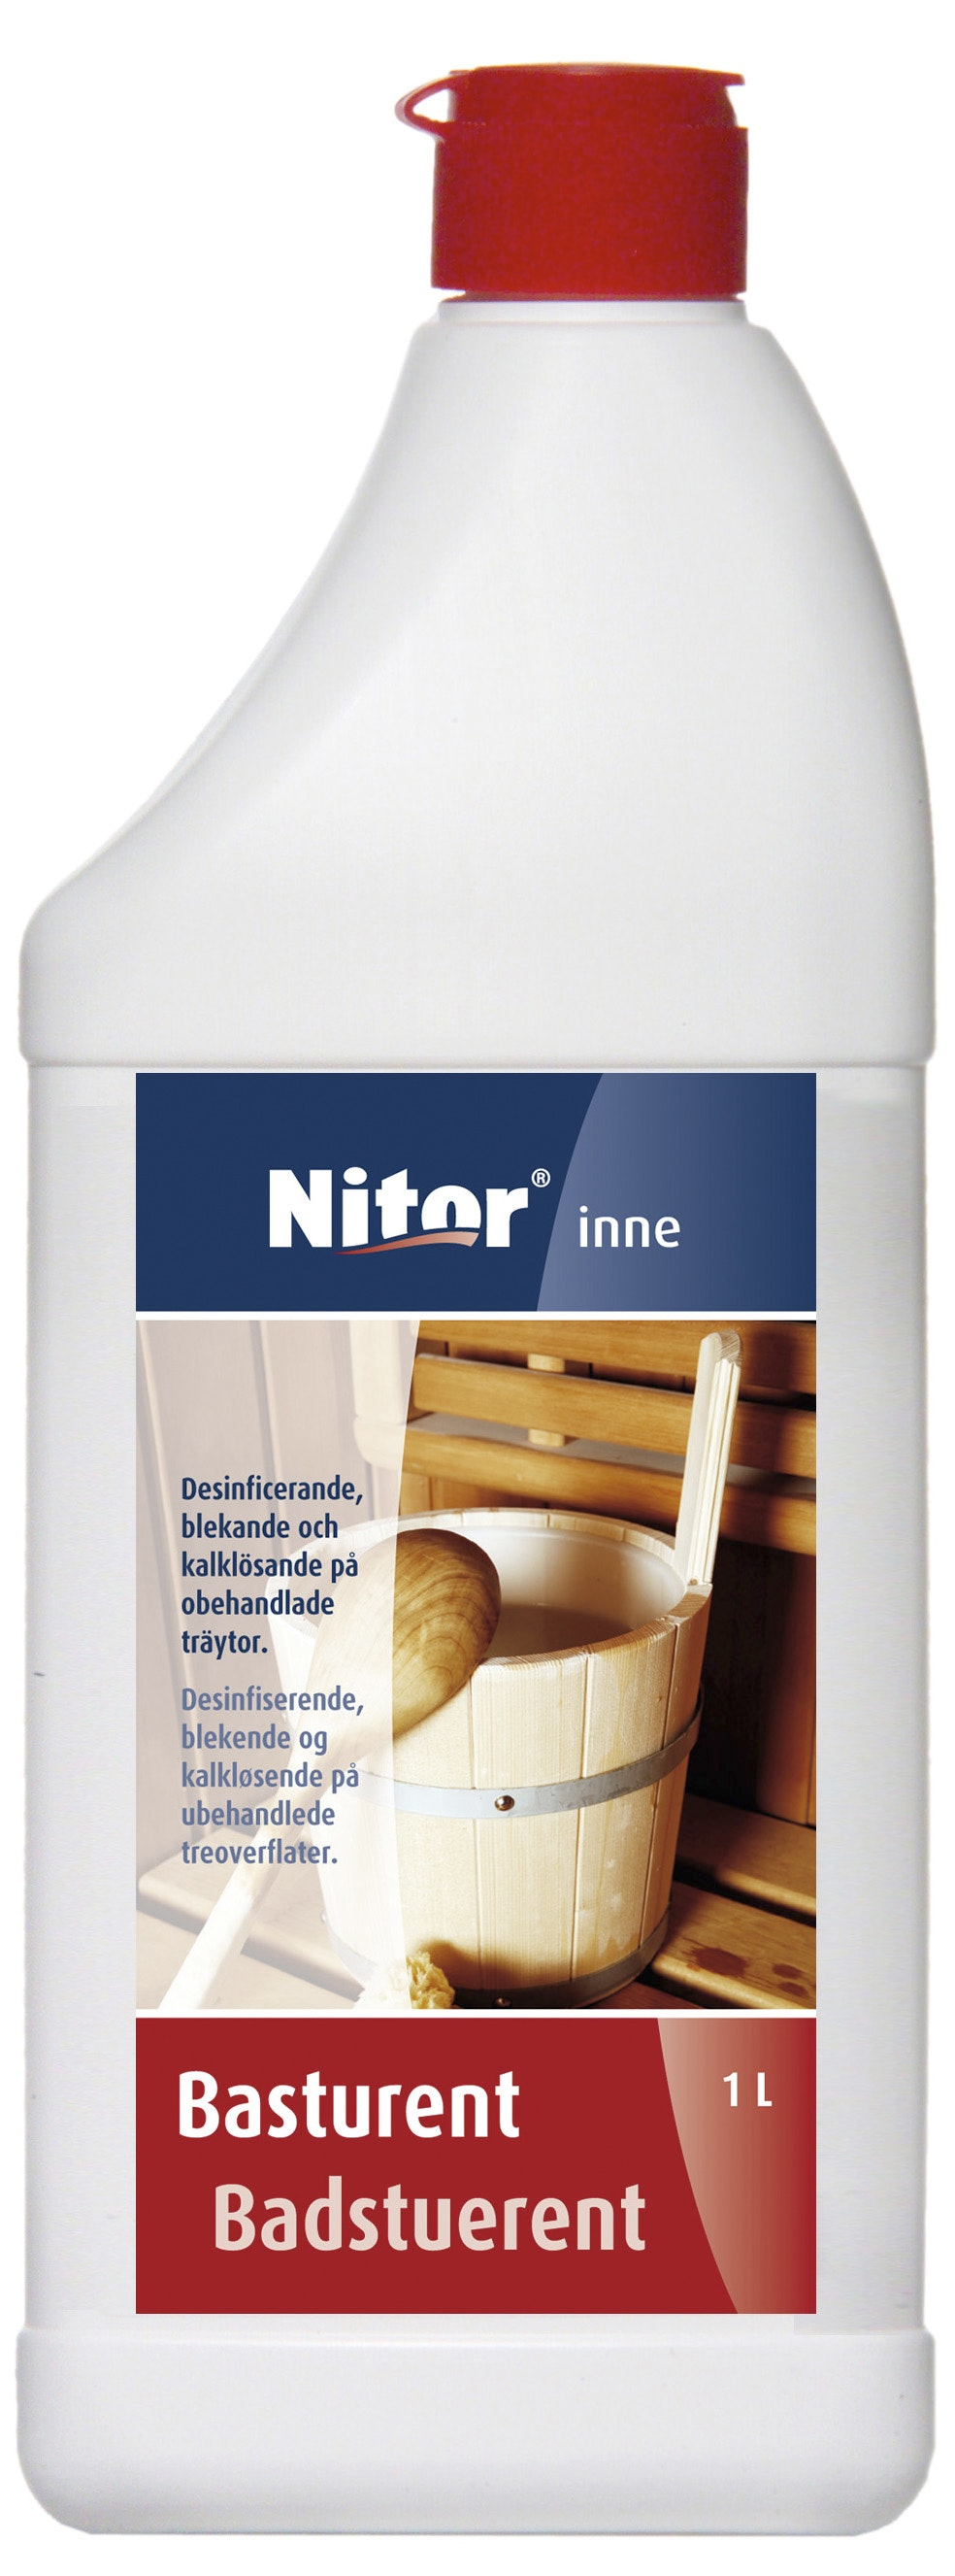 Basturent Nitor 1l